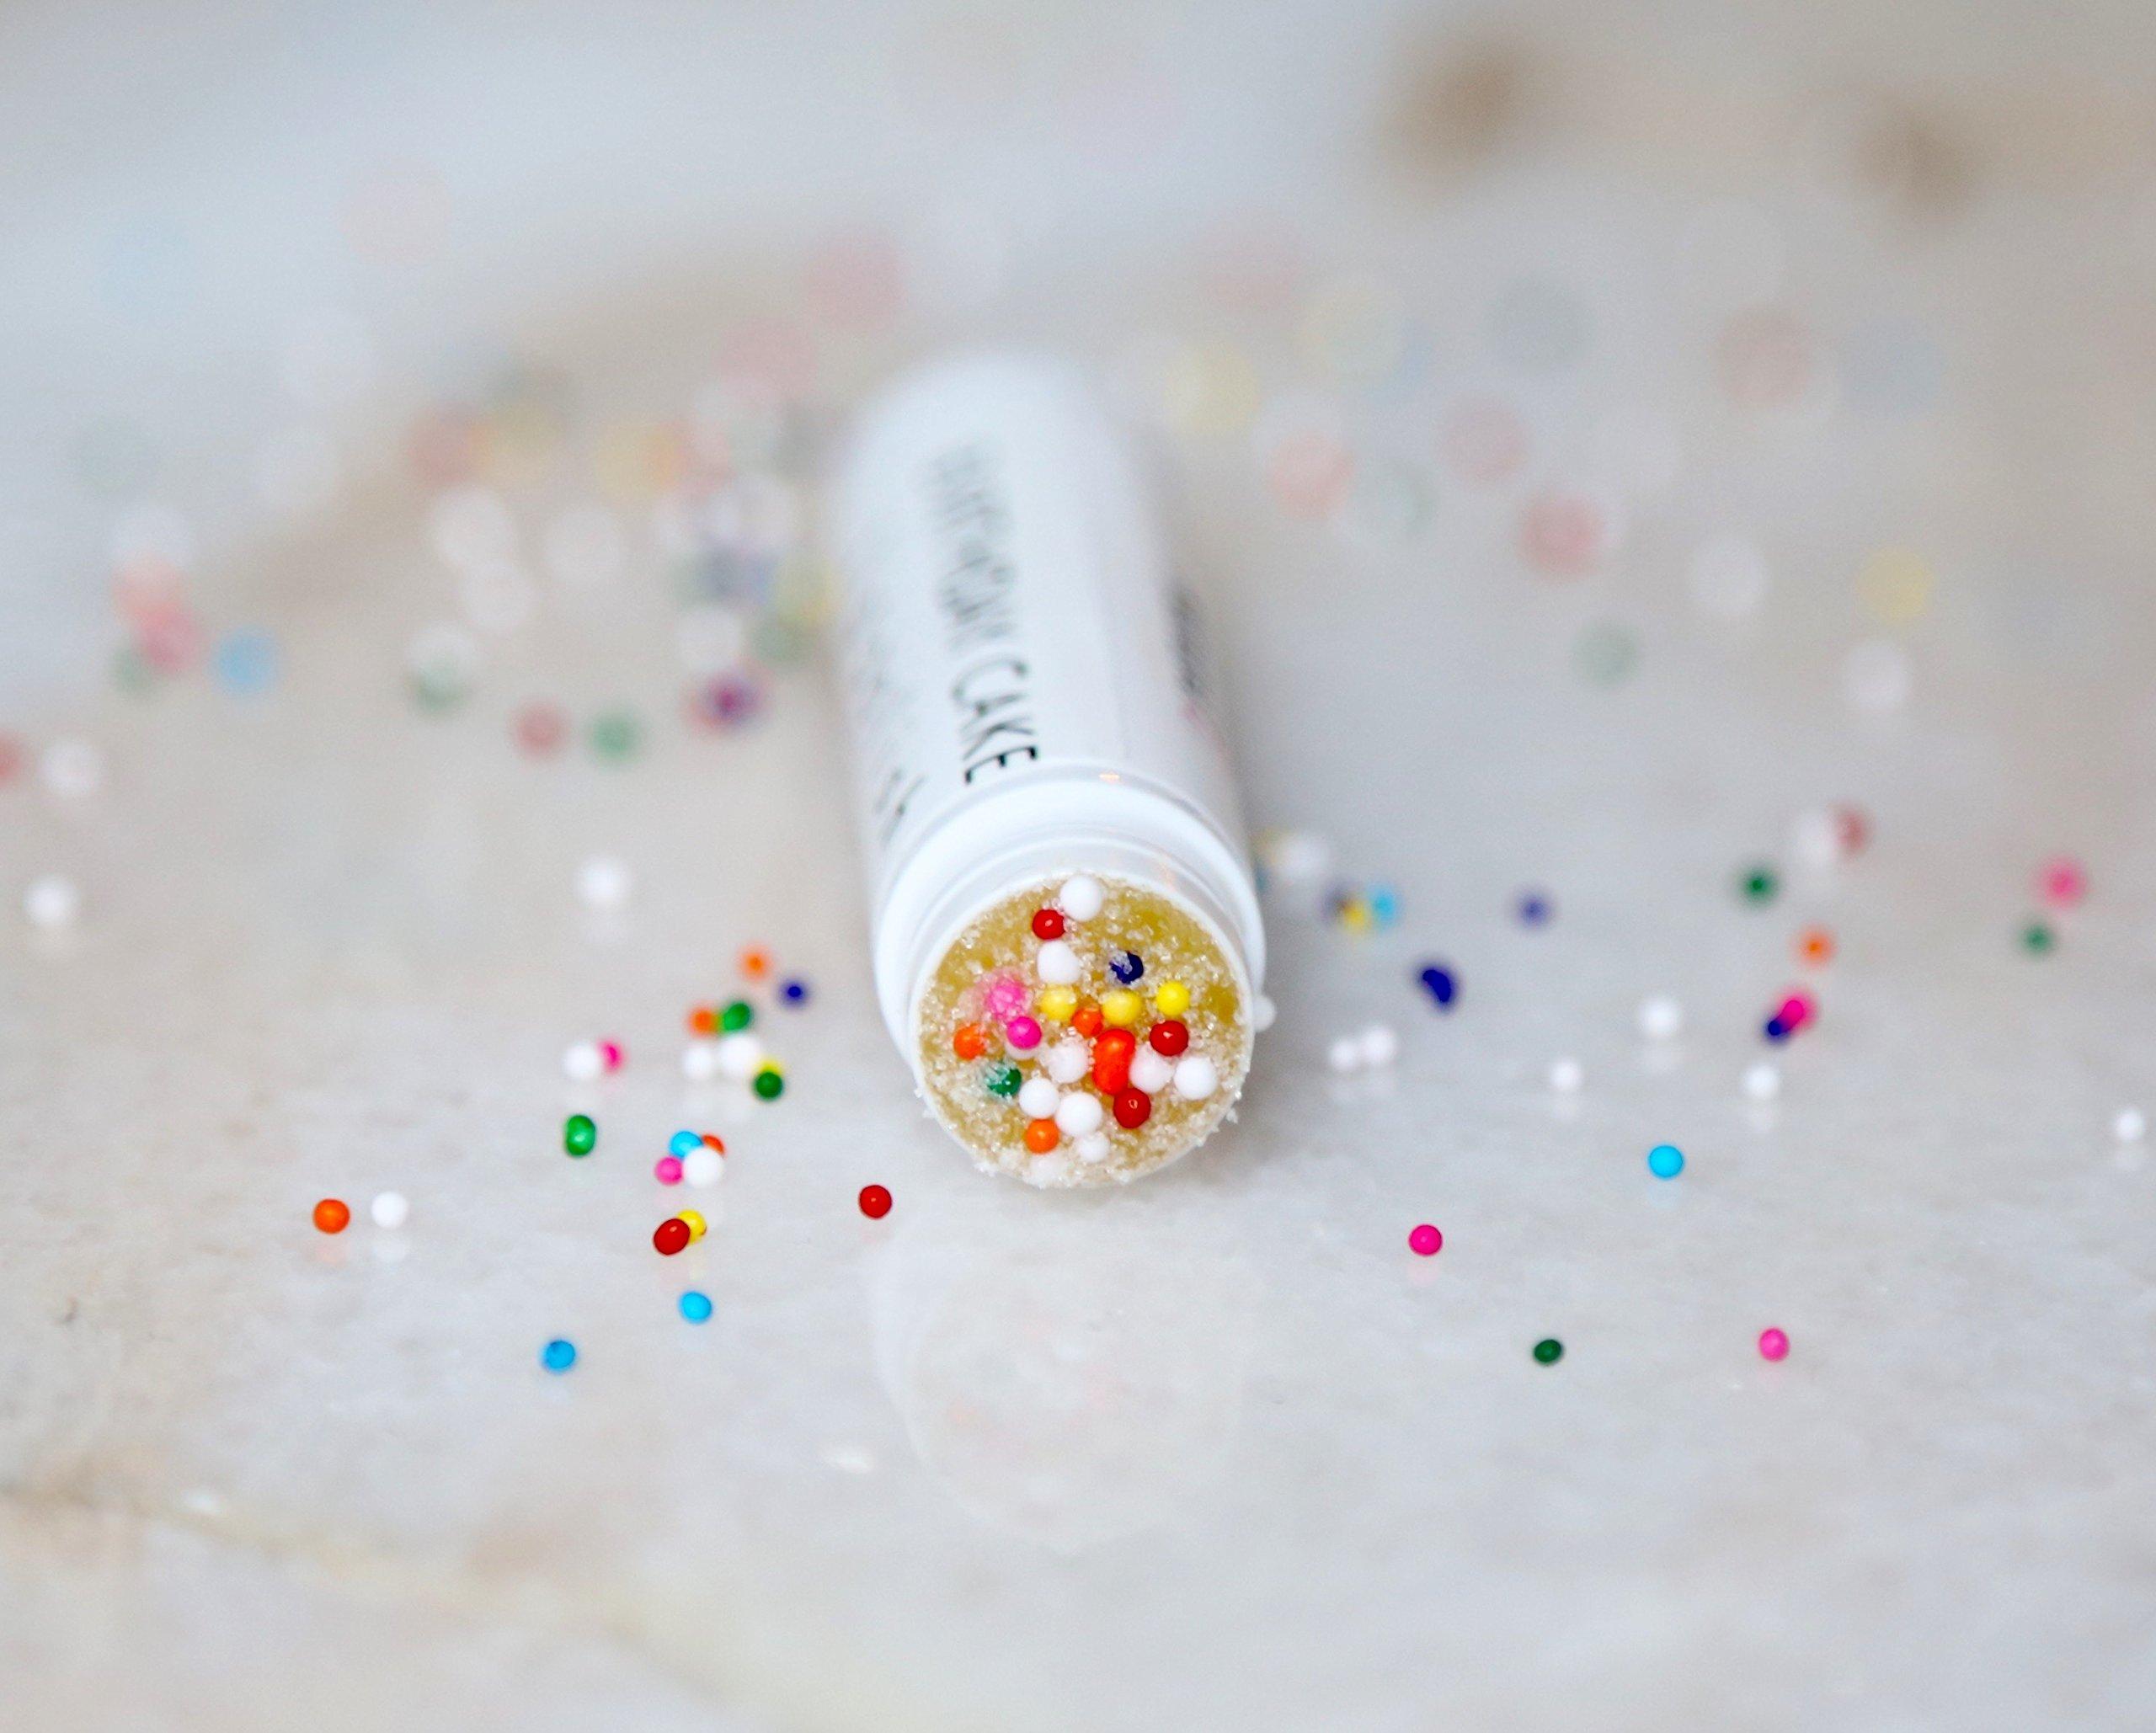 Birthday Cake Lip Scrub-Natural Vanilla Cupcake Batter Flavor-Polish & Exfoliate with Gentle Fine Sugar by Natural E